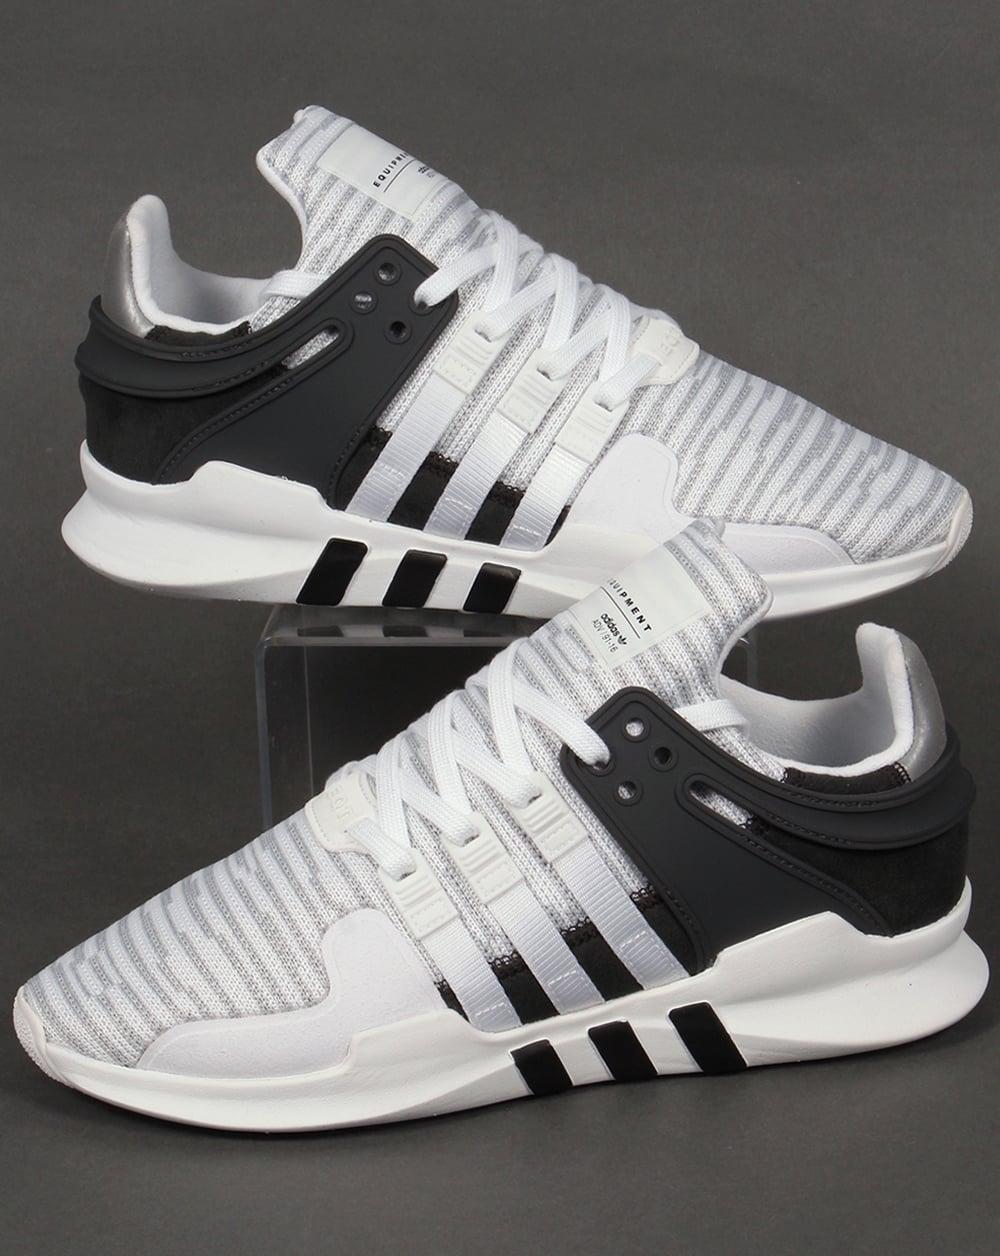 a-trainer adidas